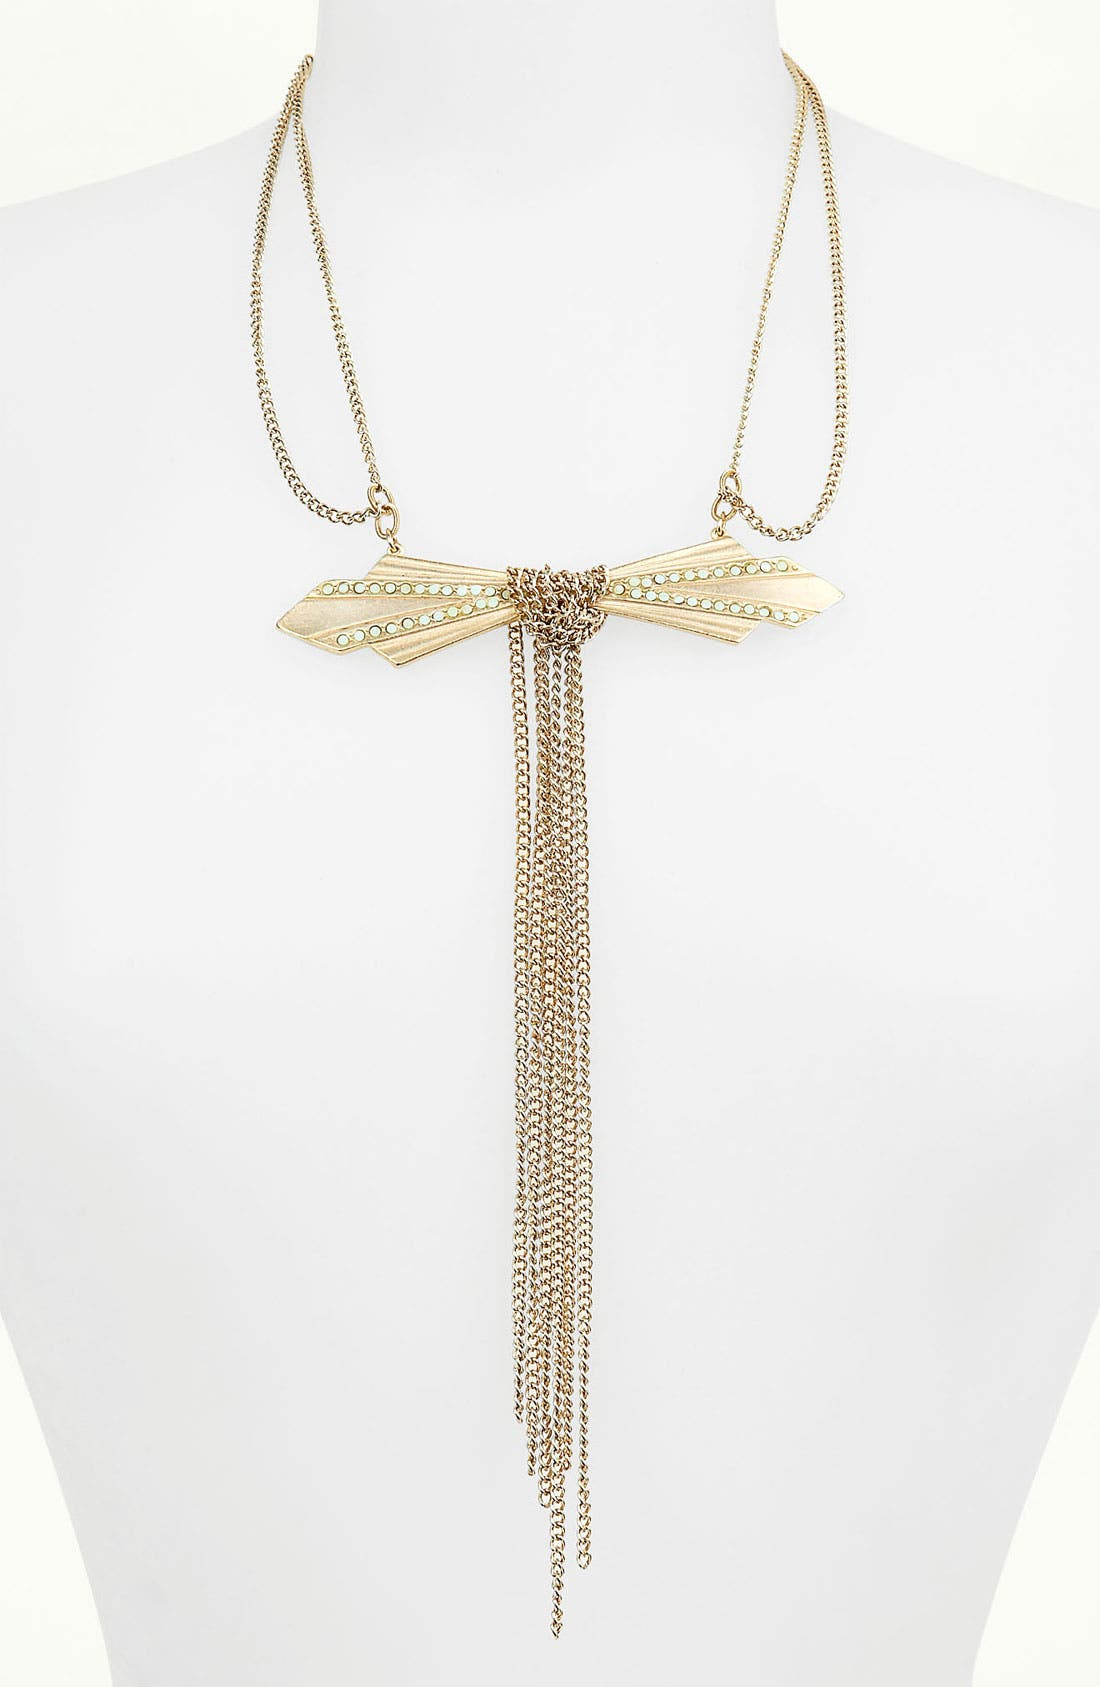 Alternate Image 1 Selected - Bonnie Jonas 'Deco Bow' Necklace